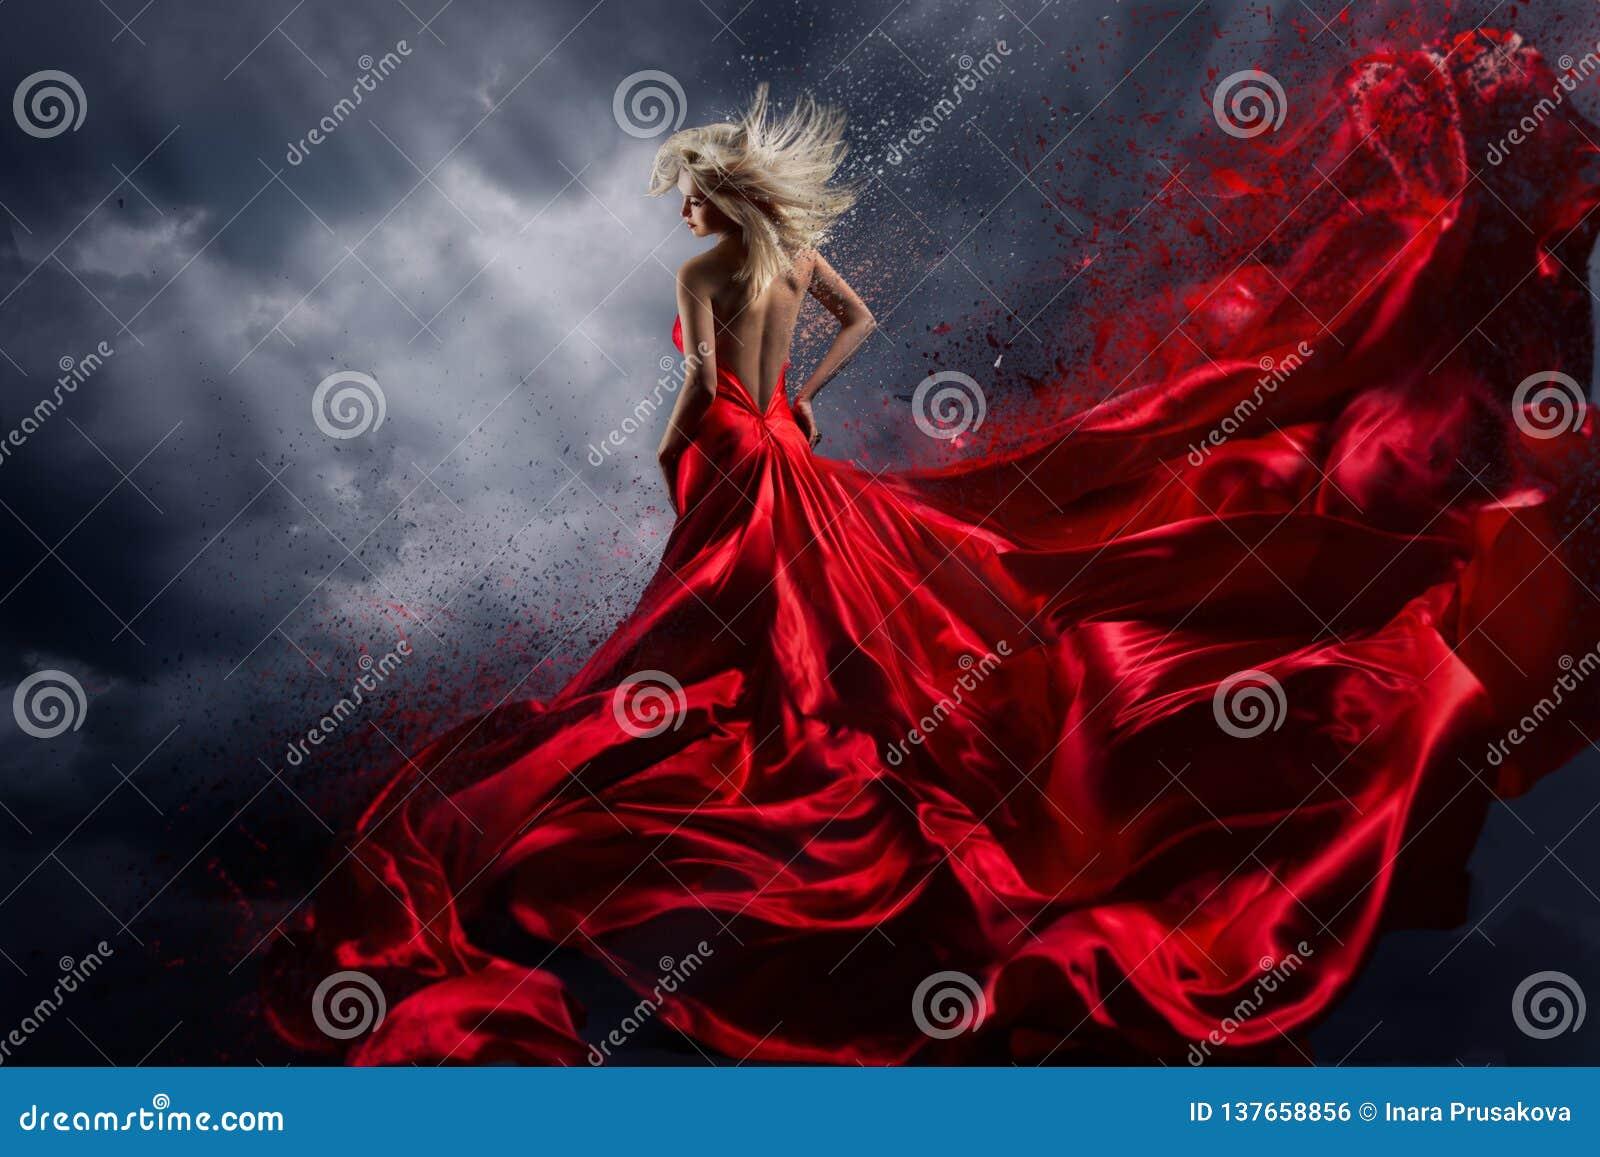 Vrouw in Rode Kledingsdans over Onweershemel, Toga Fladderende Stof